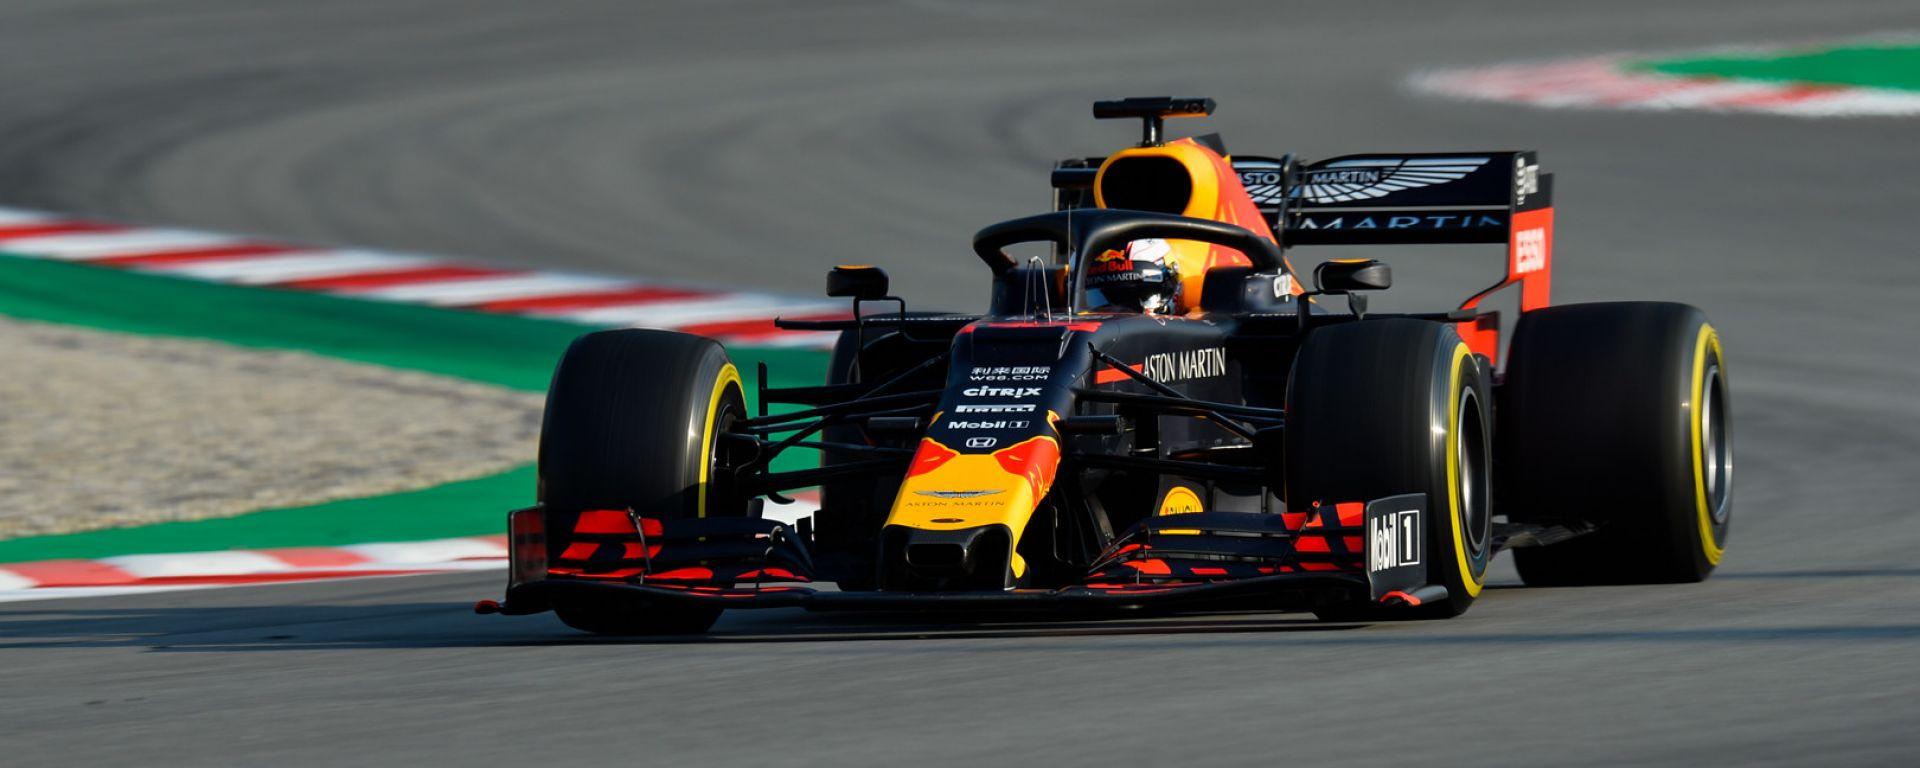 Test F1 2019 Barcellona, Max Verstappen sulla RB15